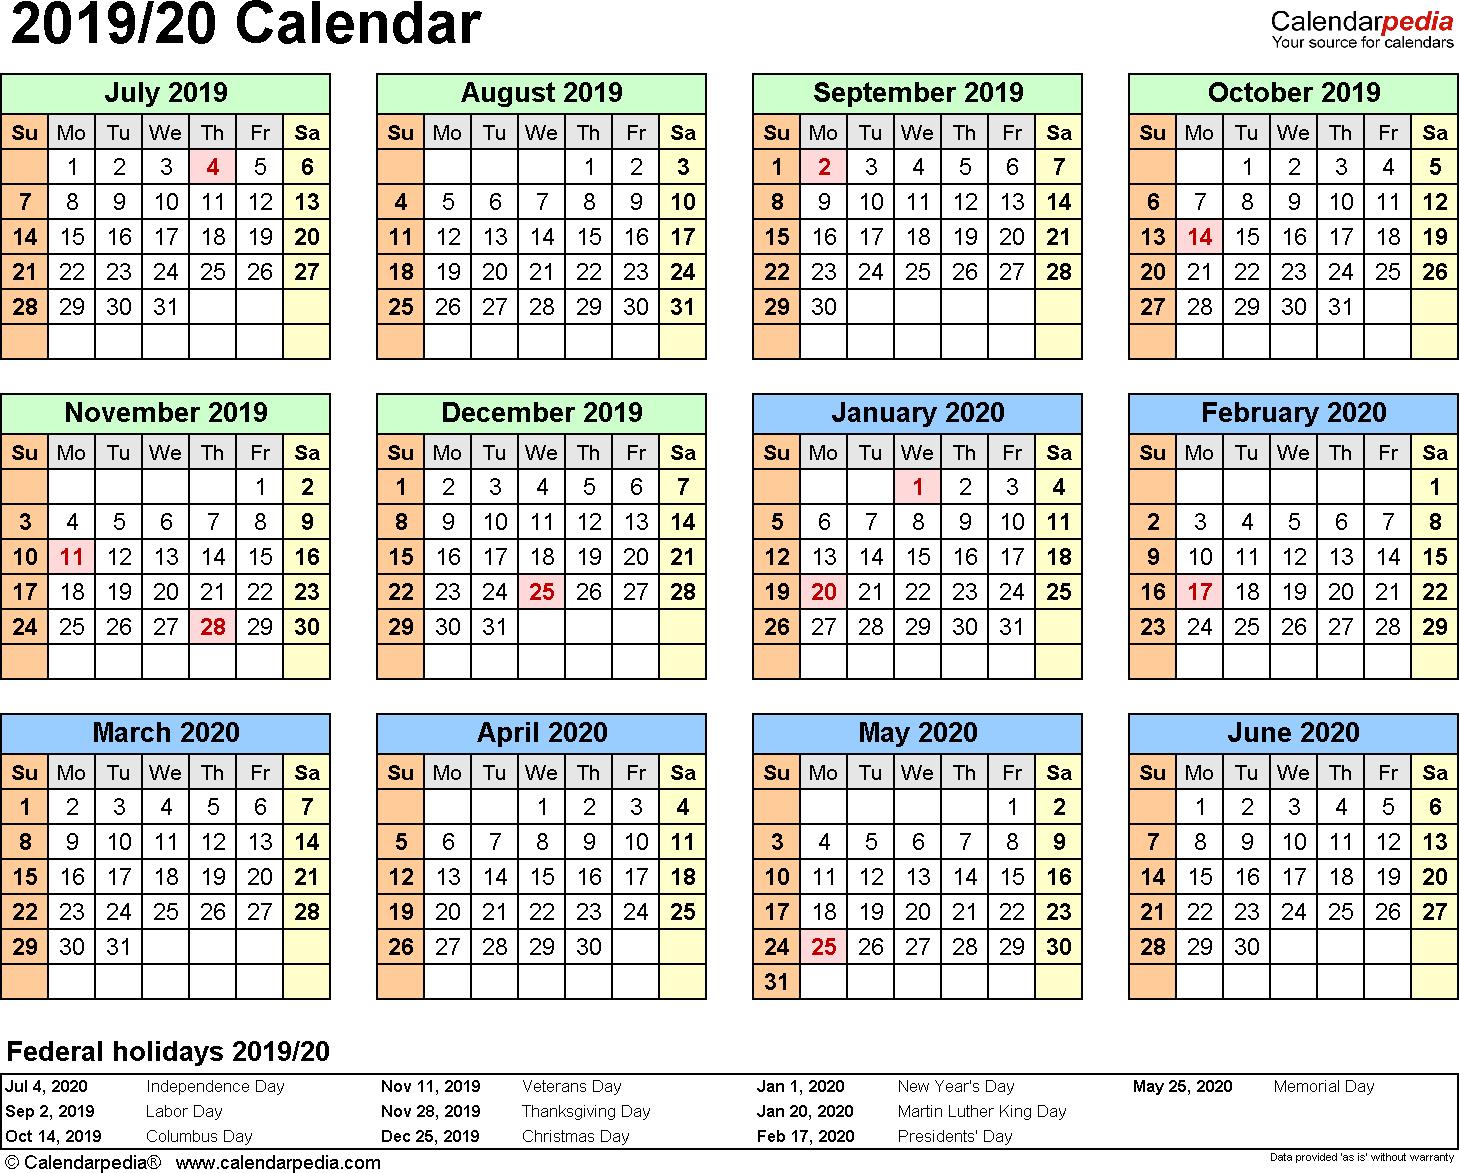 Split Year Calendar 2019/20 (July To June) - Excel Templates